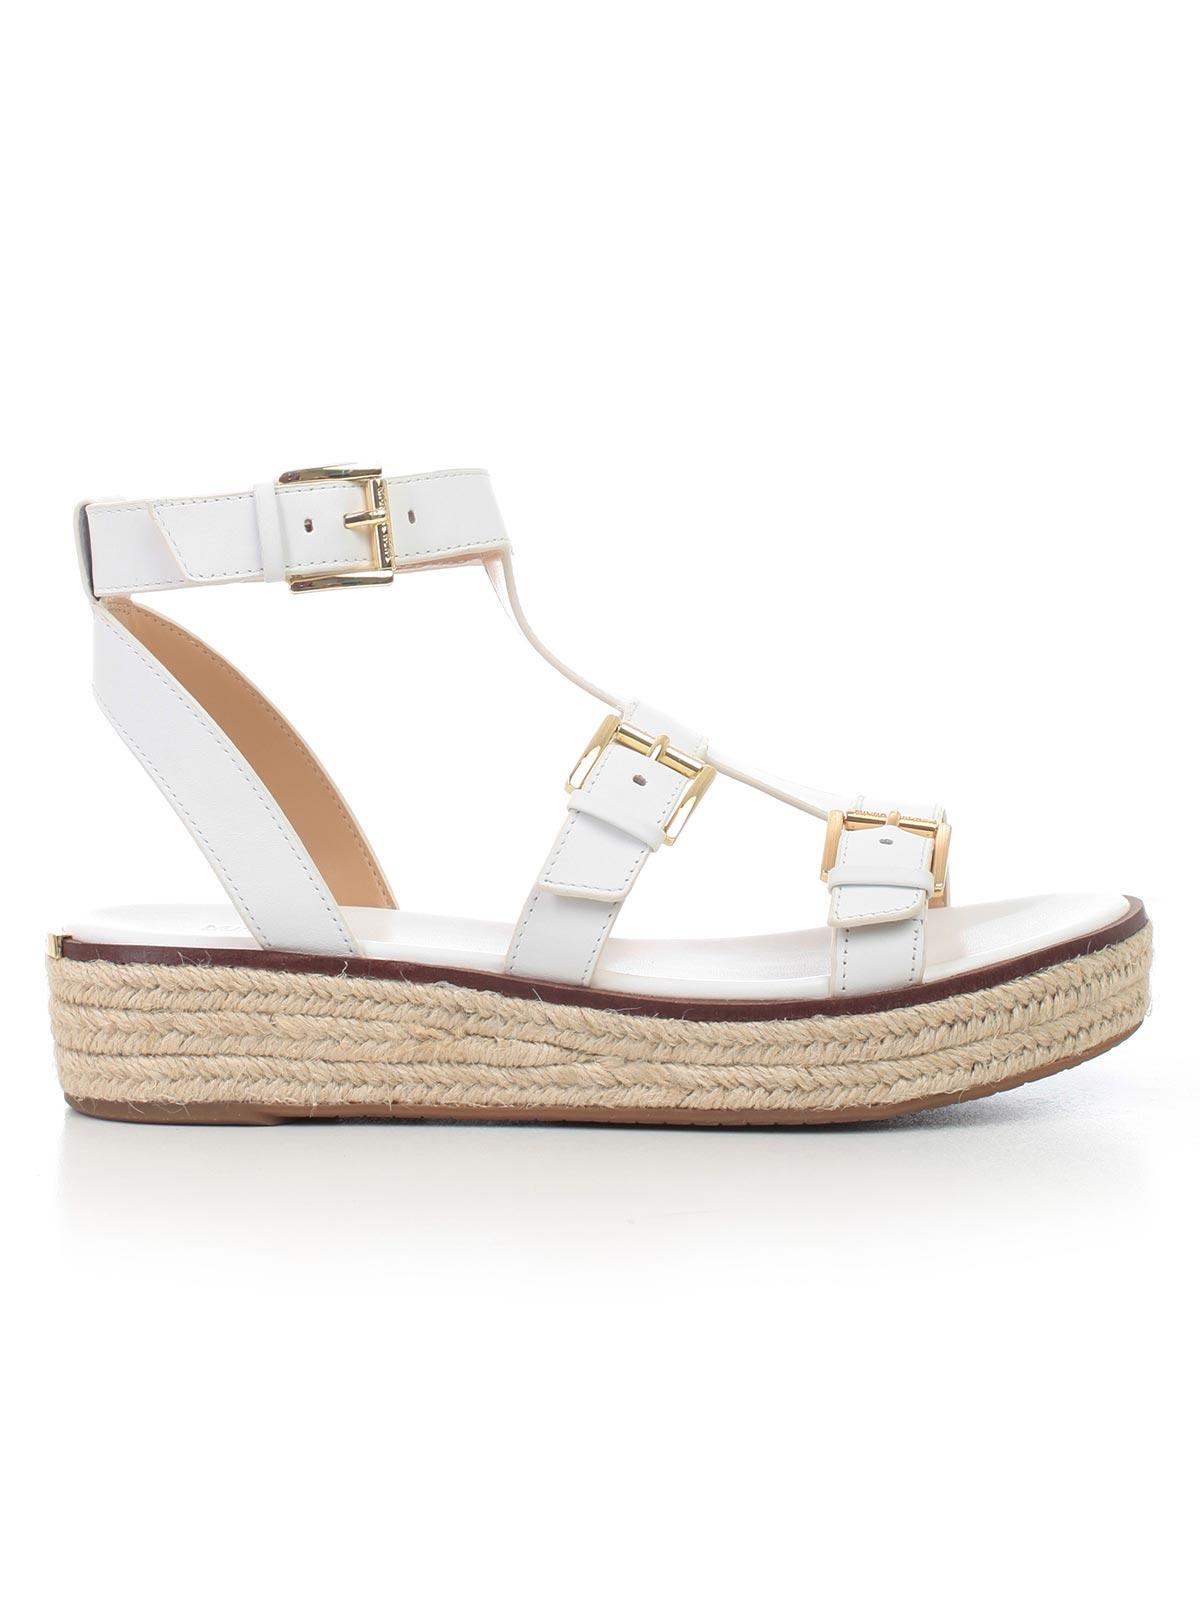 e281a4261f Women's Designer Shoes 2015 Fashion.Bernardelli Store - Online ...